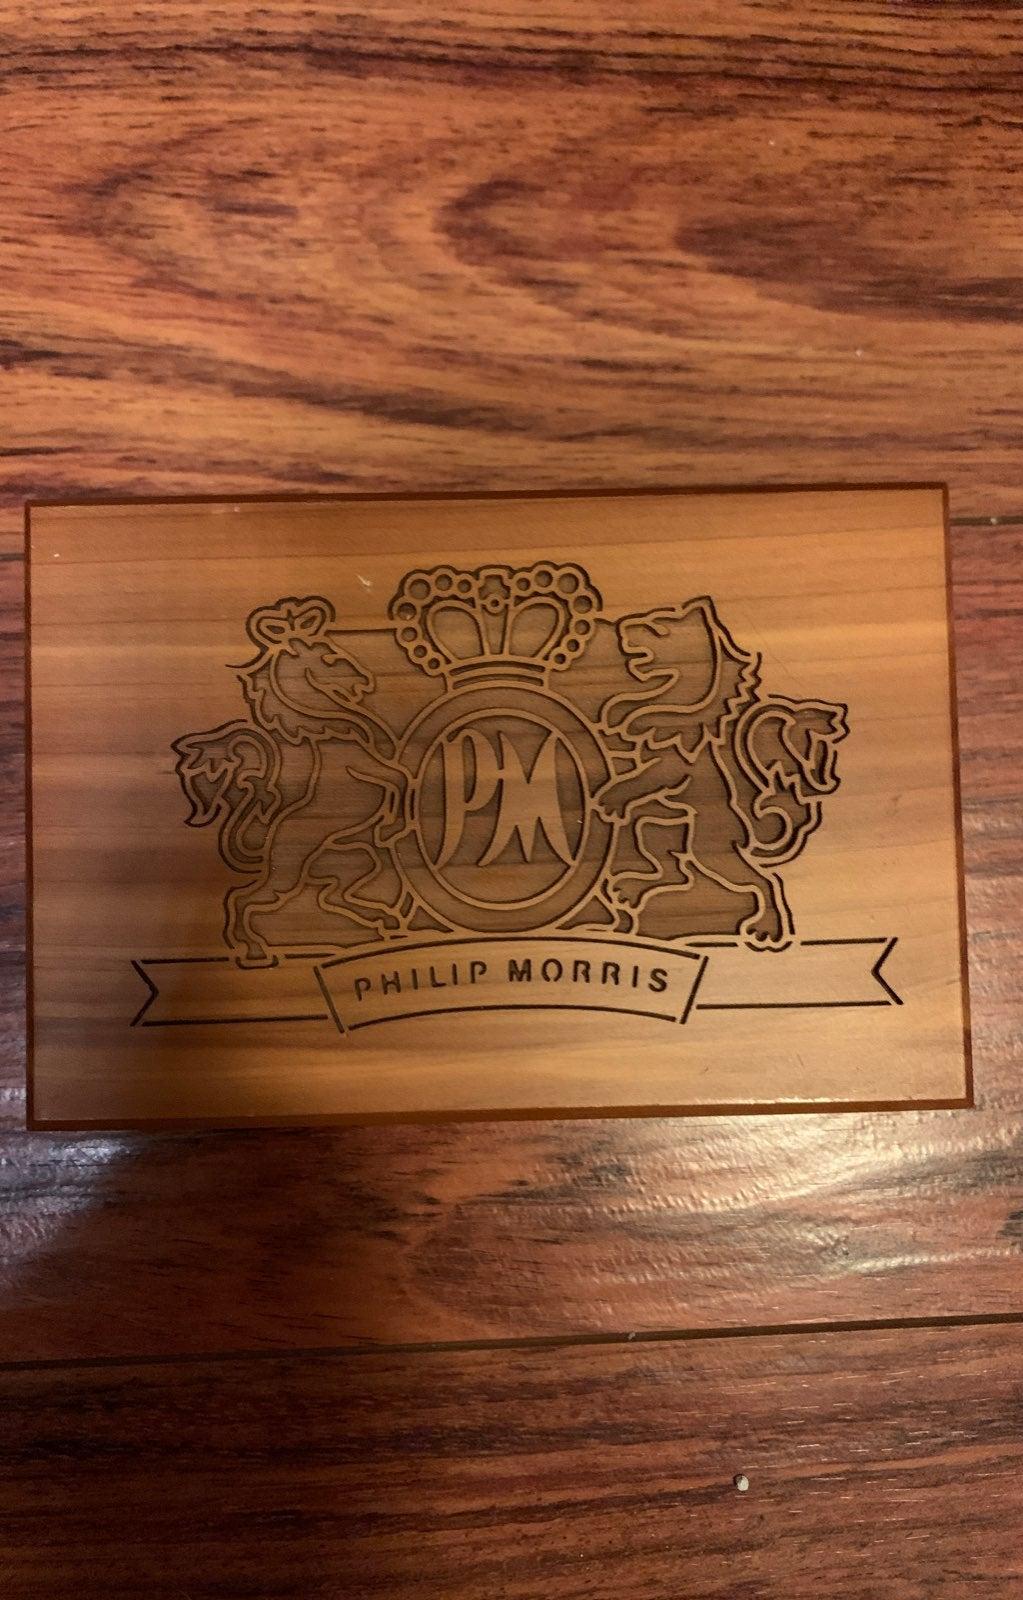 Phillip Morris engraved wooden box